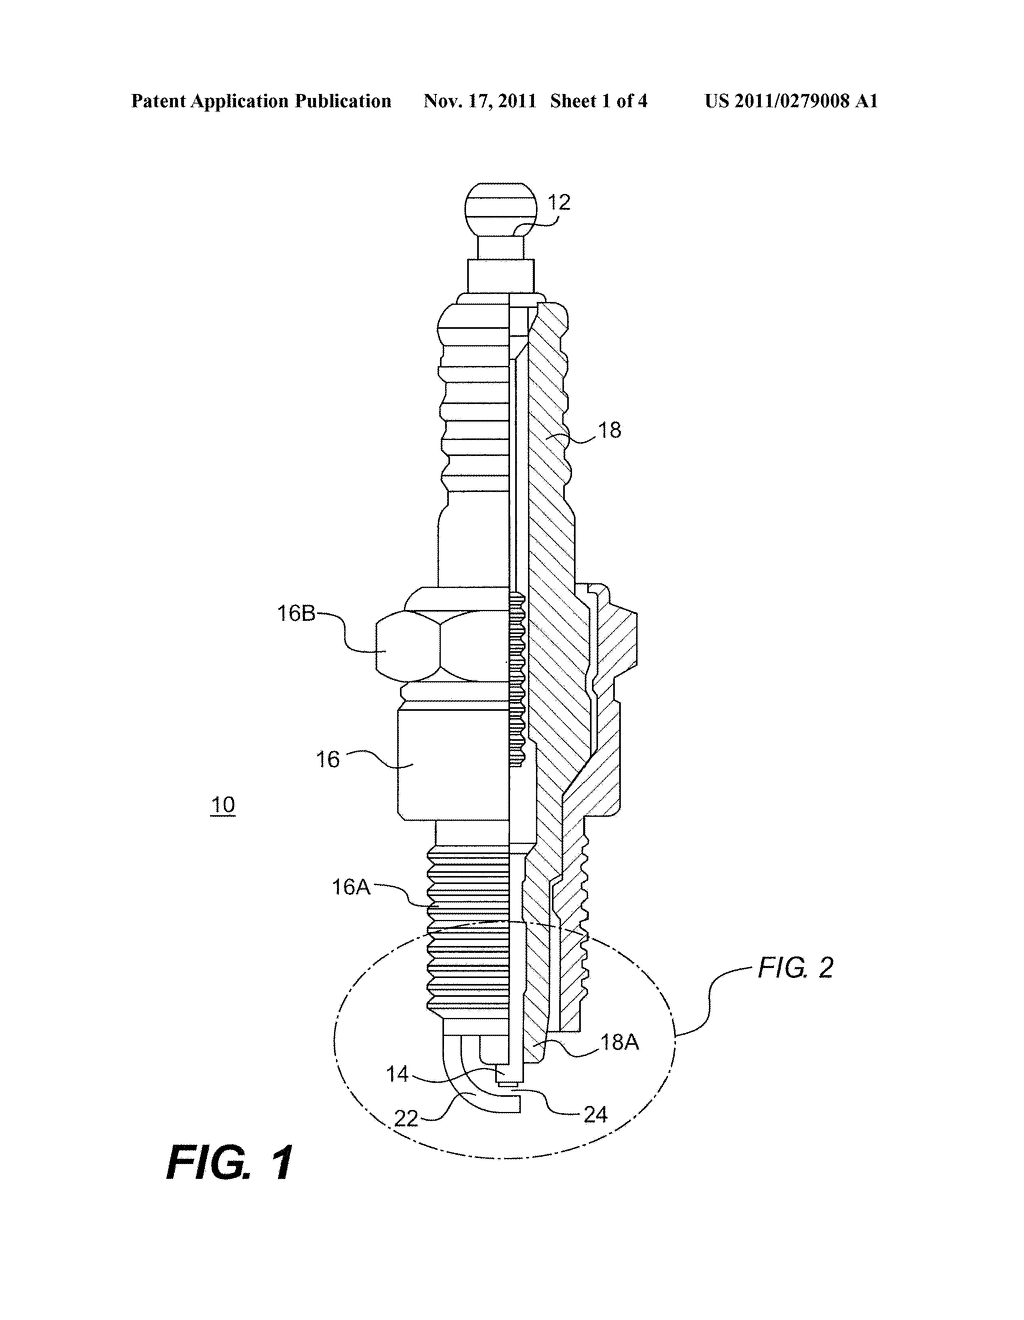 small resolution of spark plug diagram schematic and image 02 tattoos diagram spark plug diagram schematic